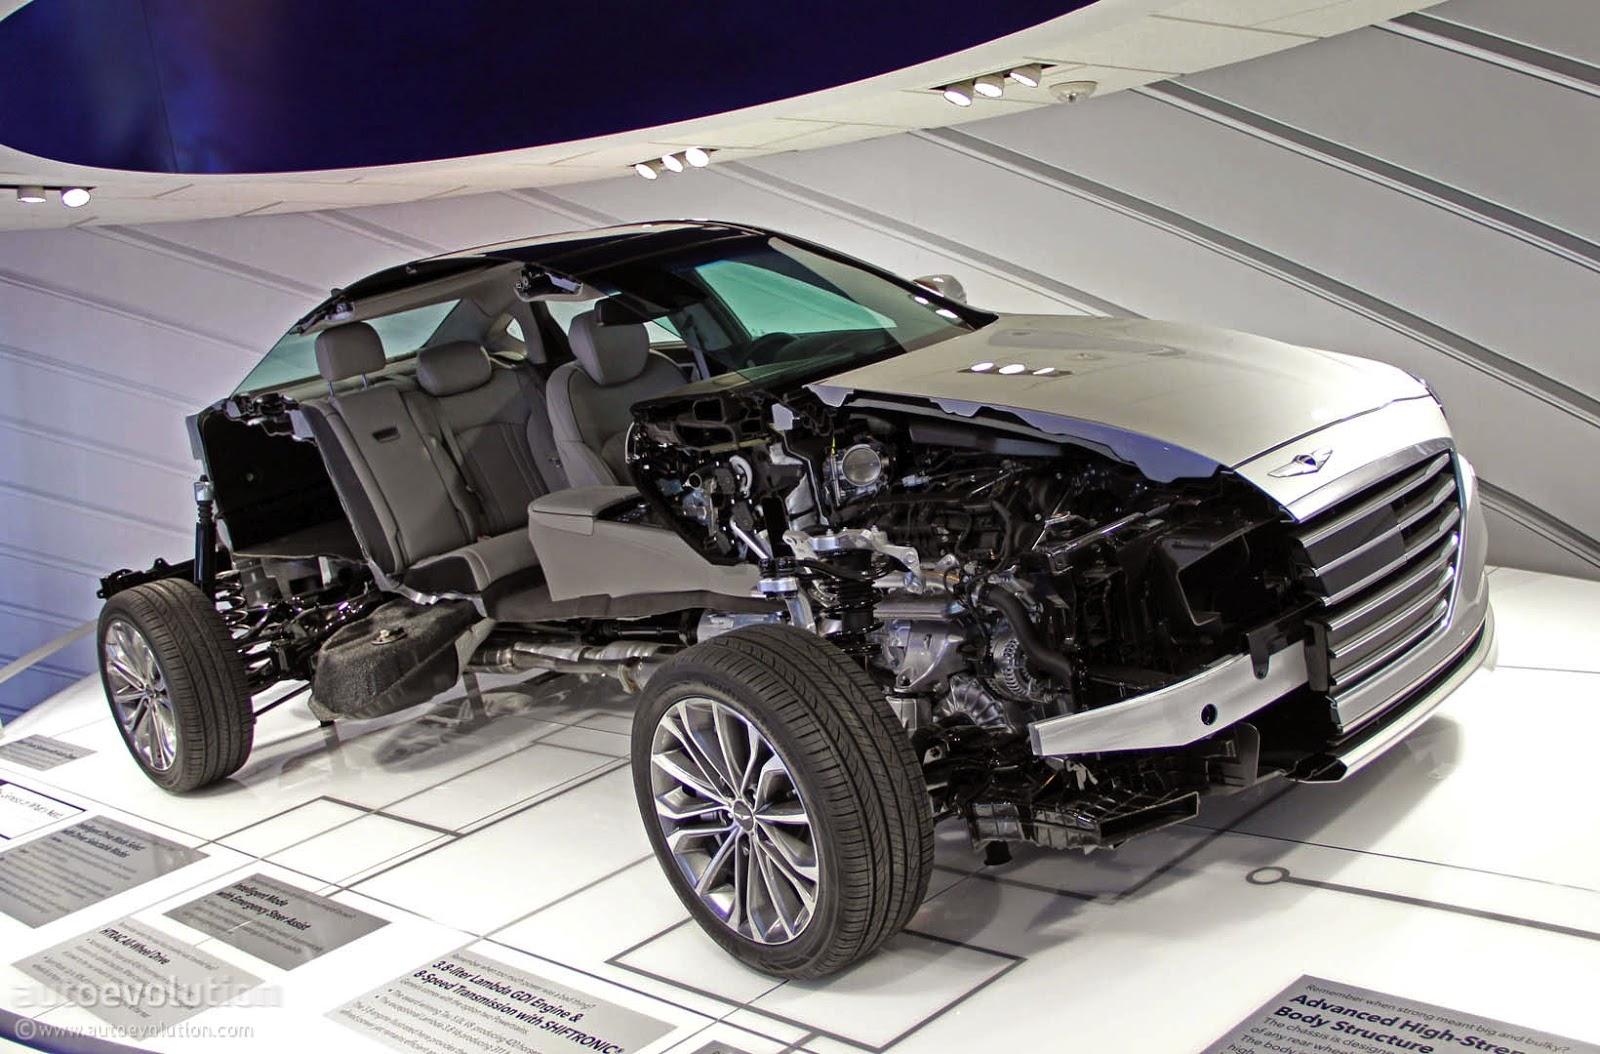 Popular Mechanics Awards The 2015 Hyundai Genesis Luxury Car Of The